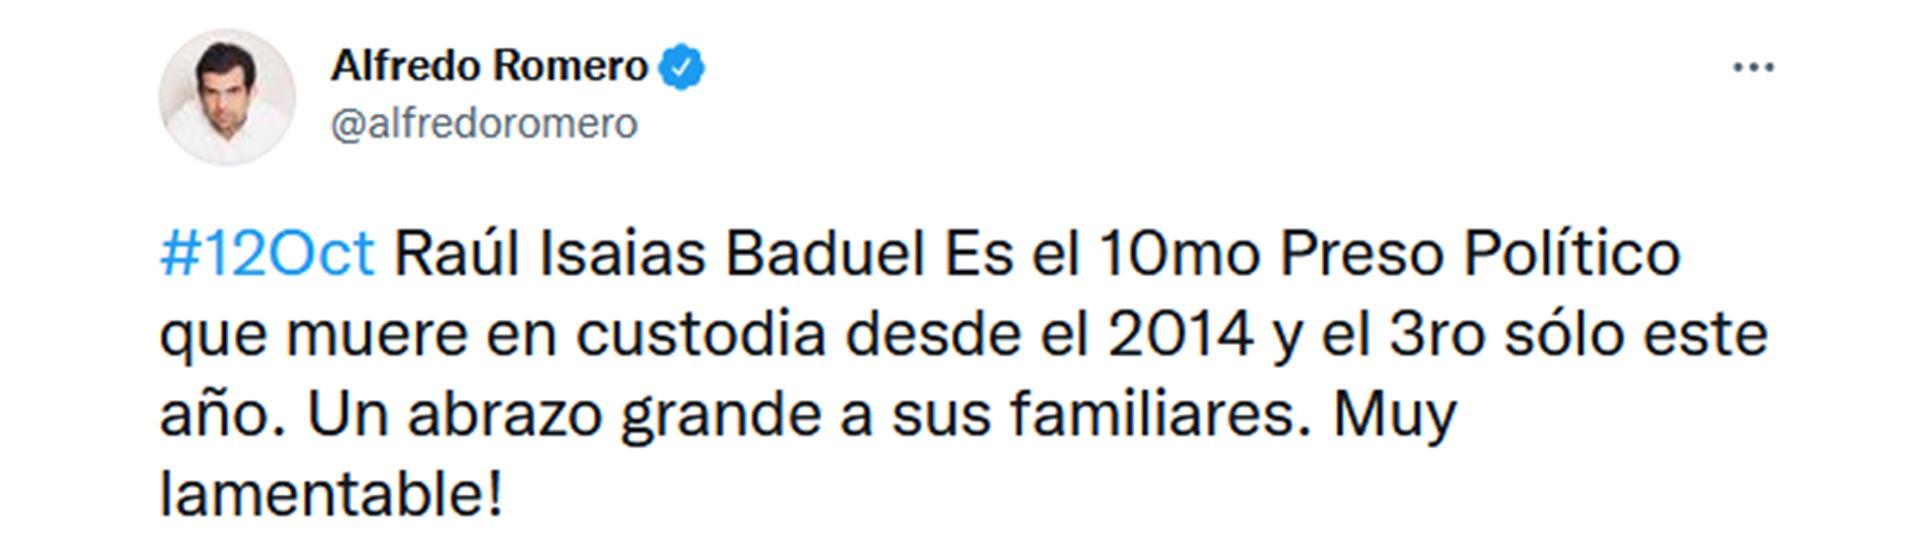 El tuit de Alfredo Romero